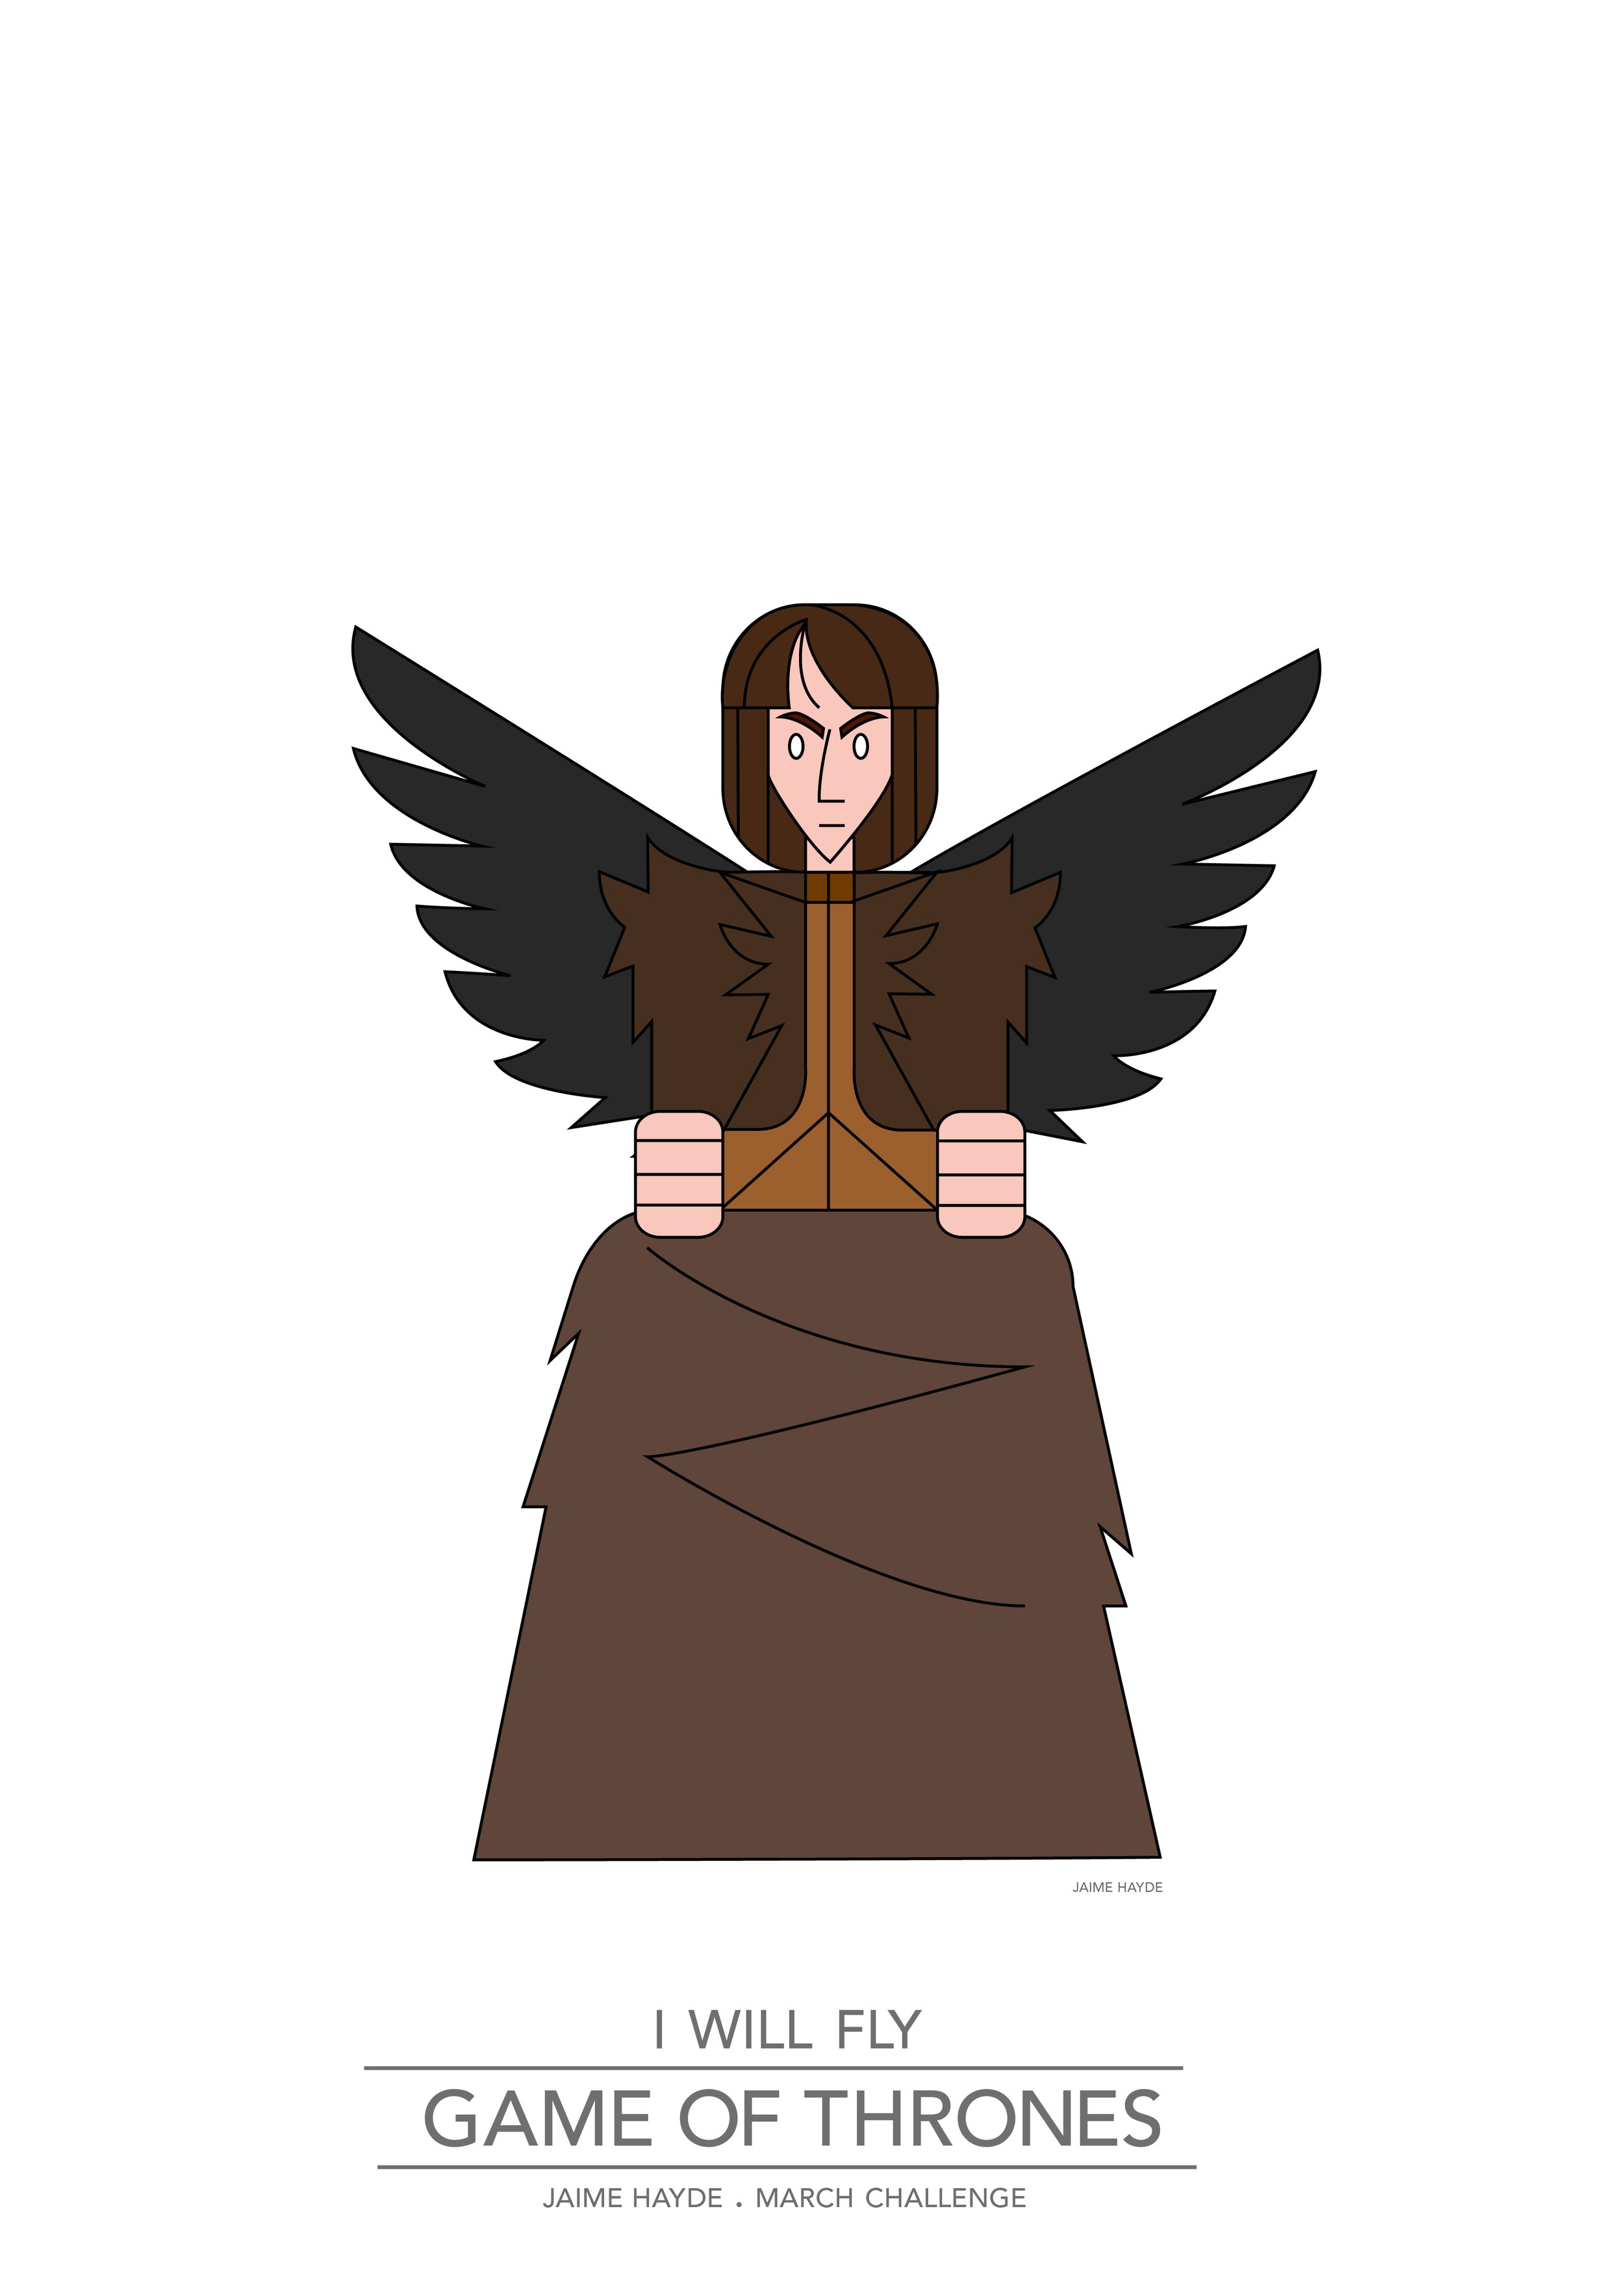 Game-of-thrones-Juego-de-tronos-the three eyed crow.jpg